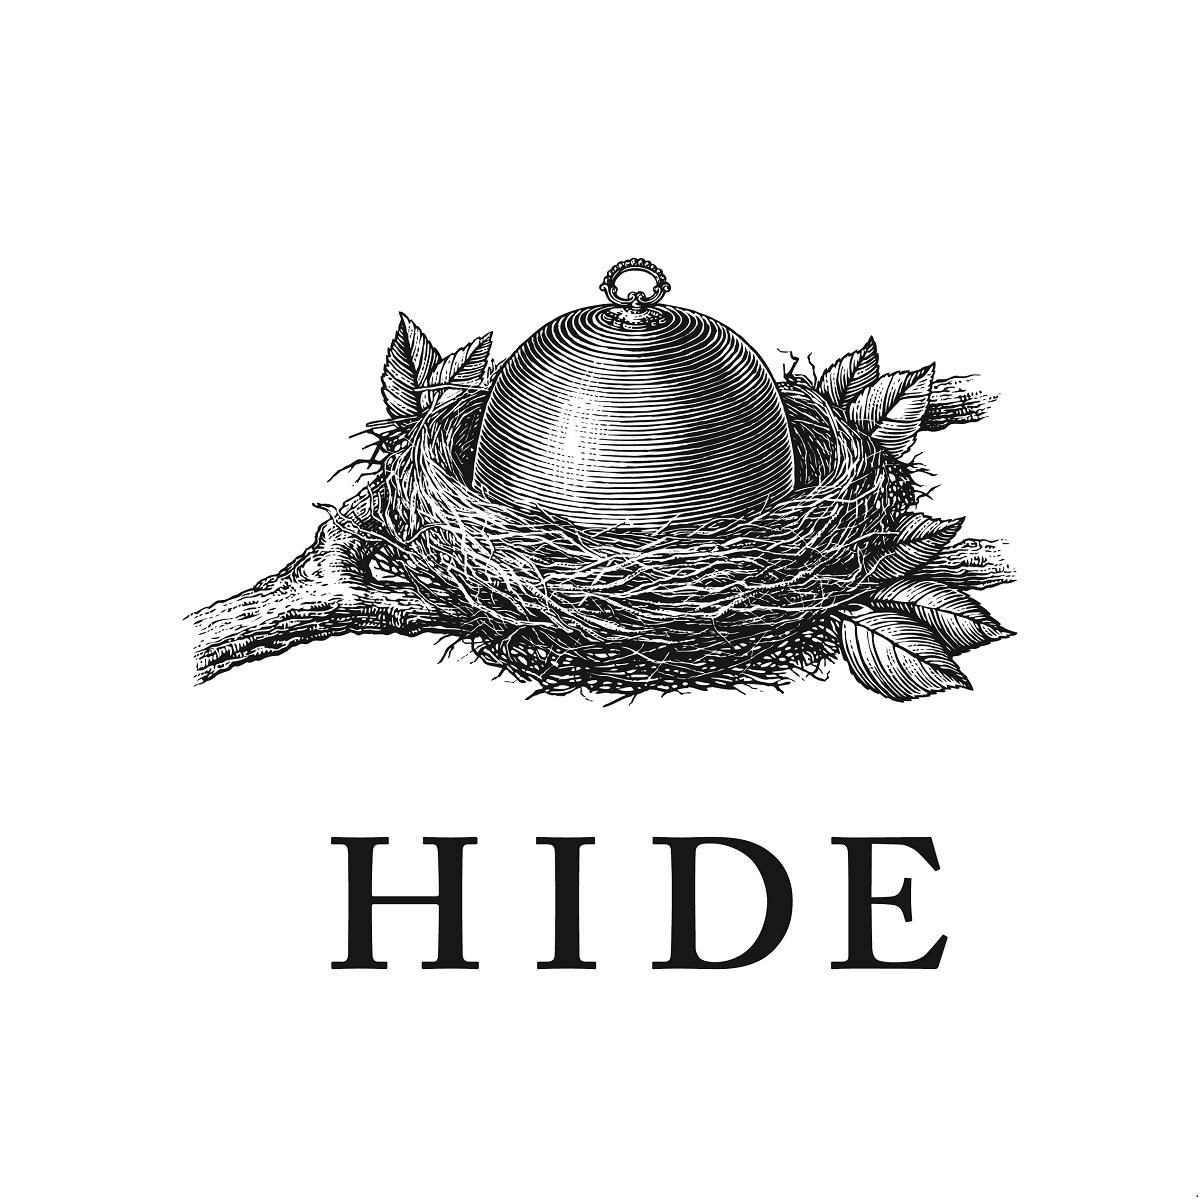 logo HIde